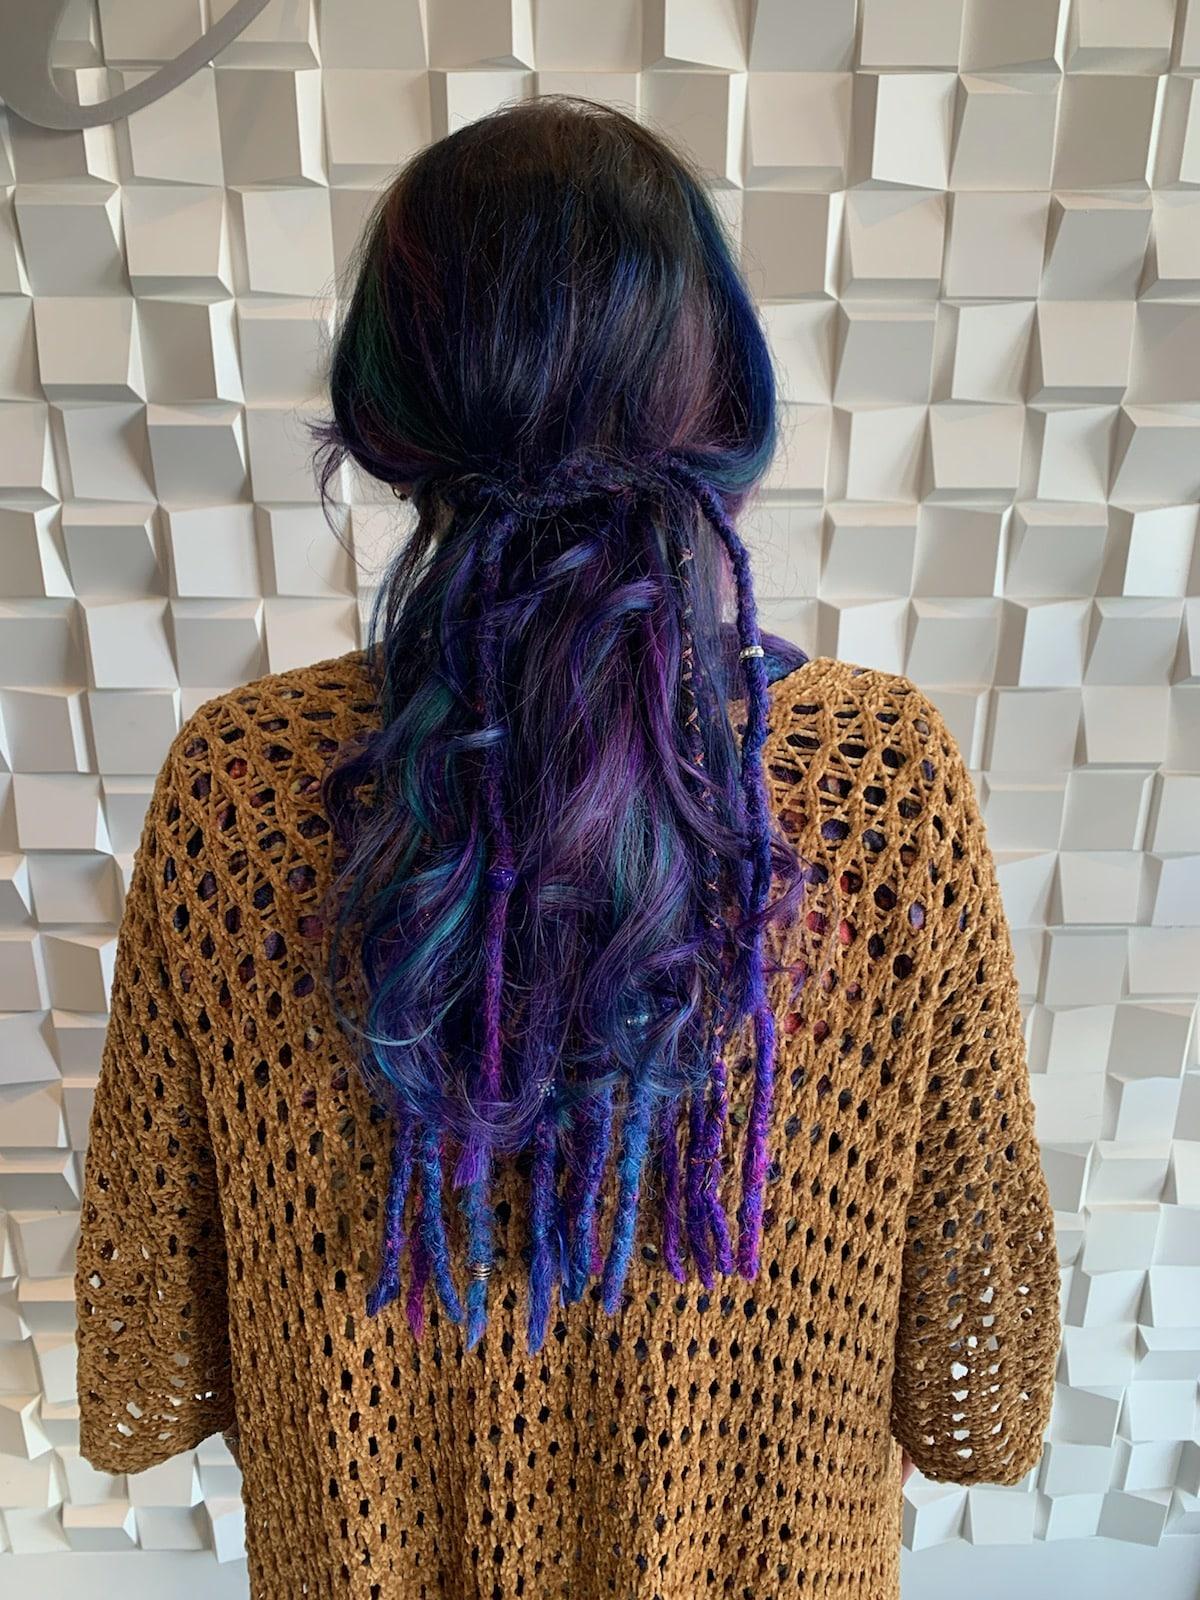 Take the Plunge with Mermaid Hair in Mercer Island